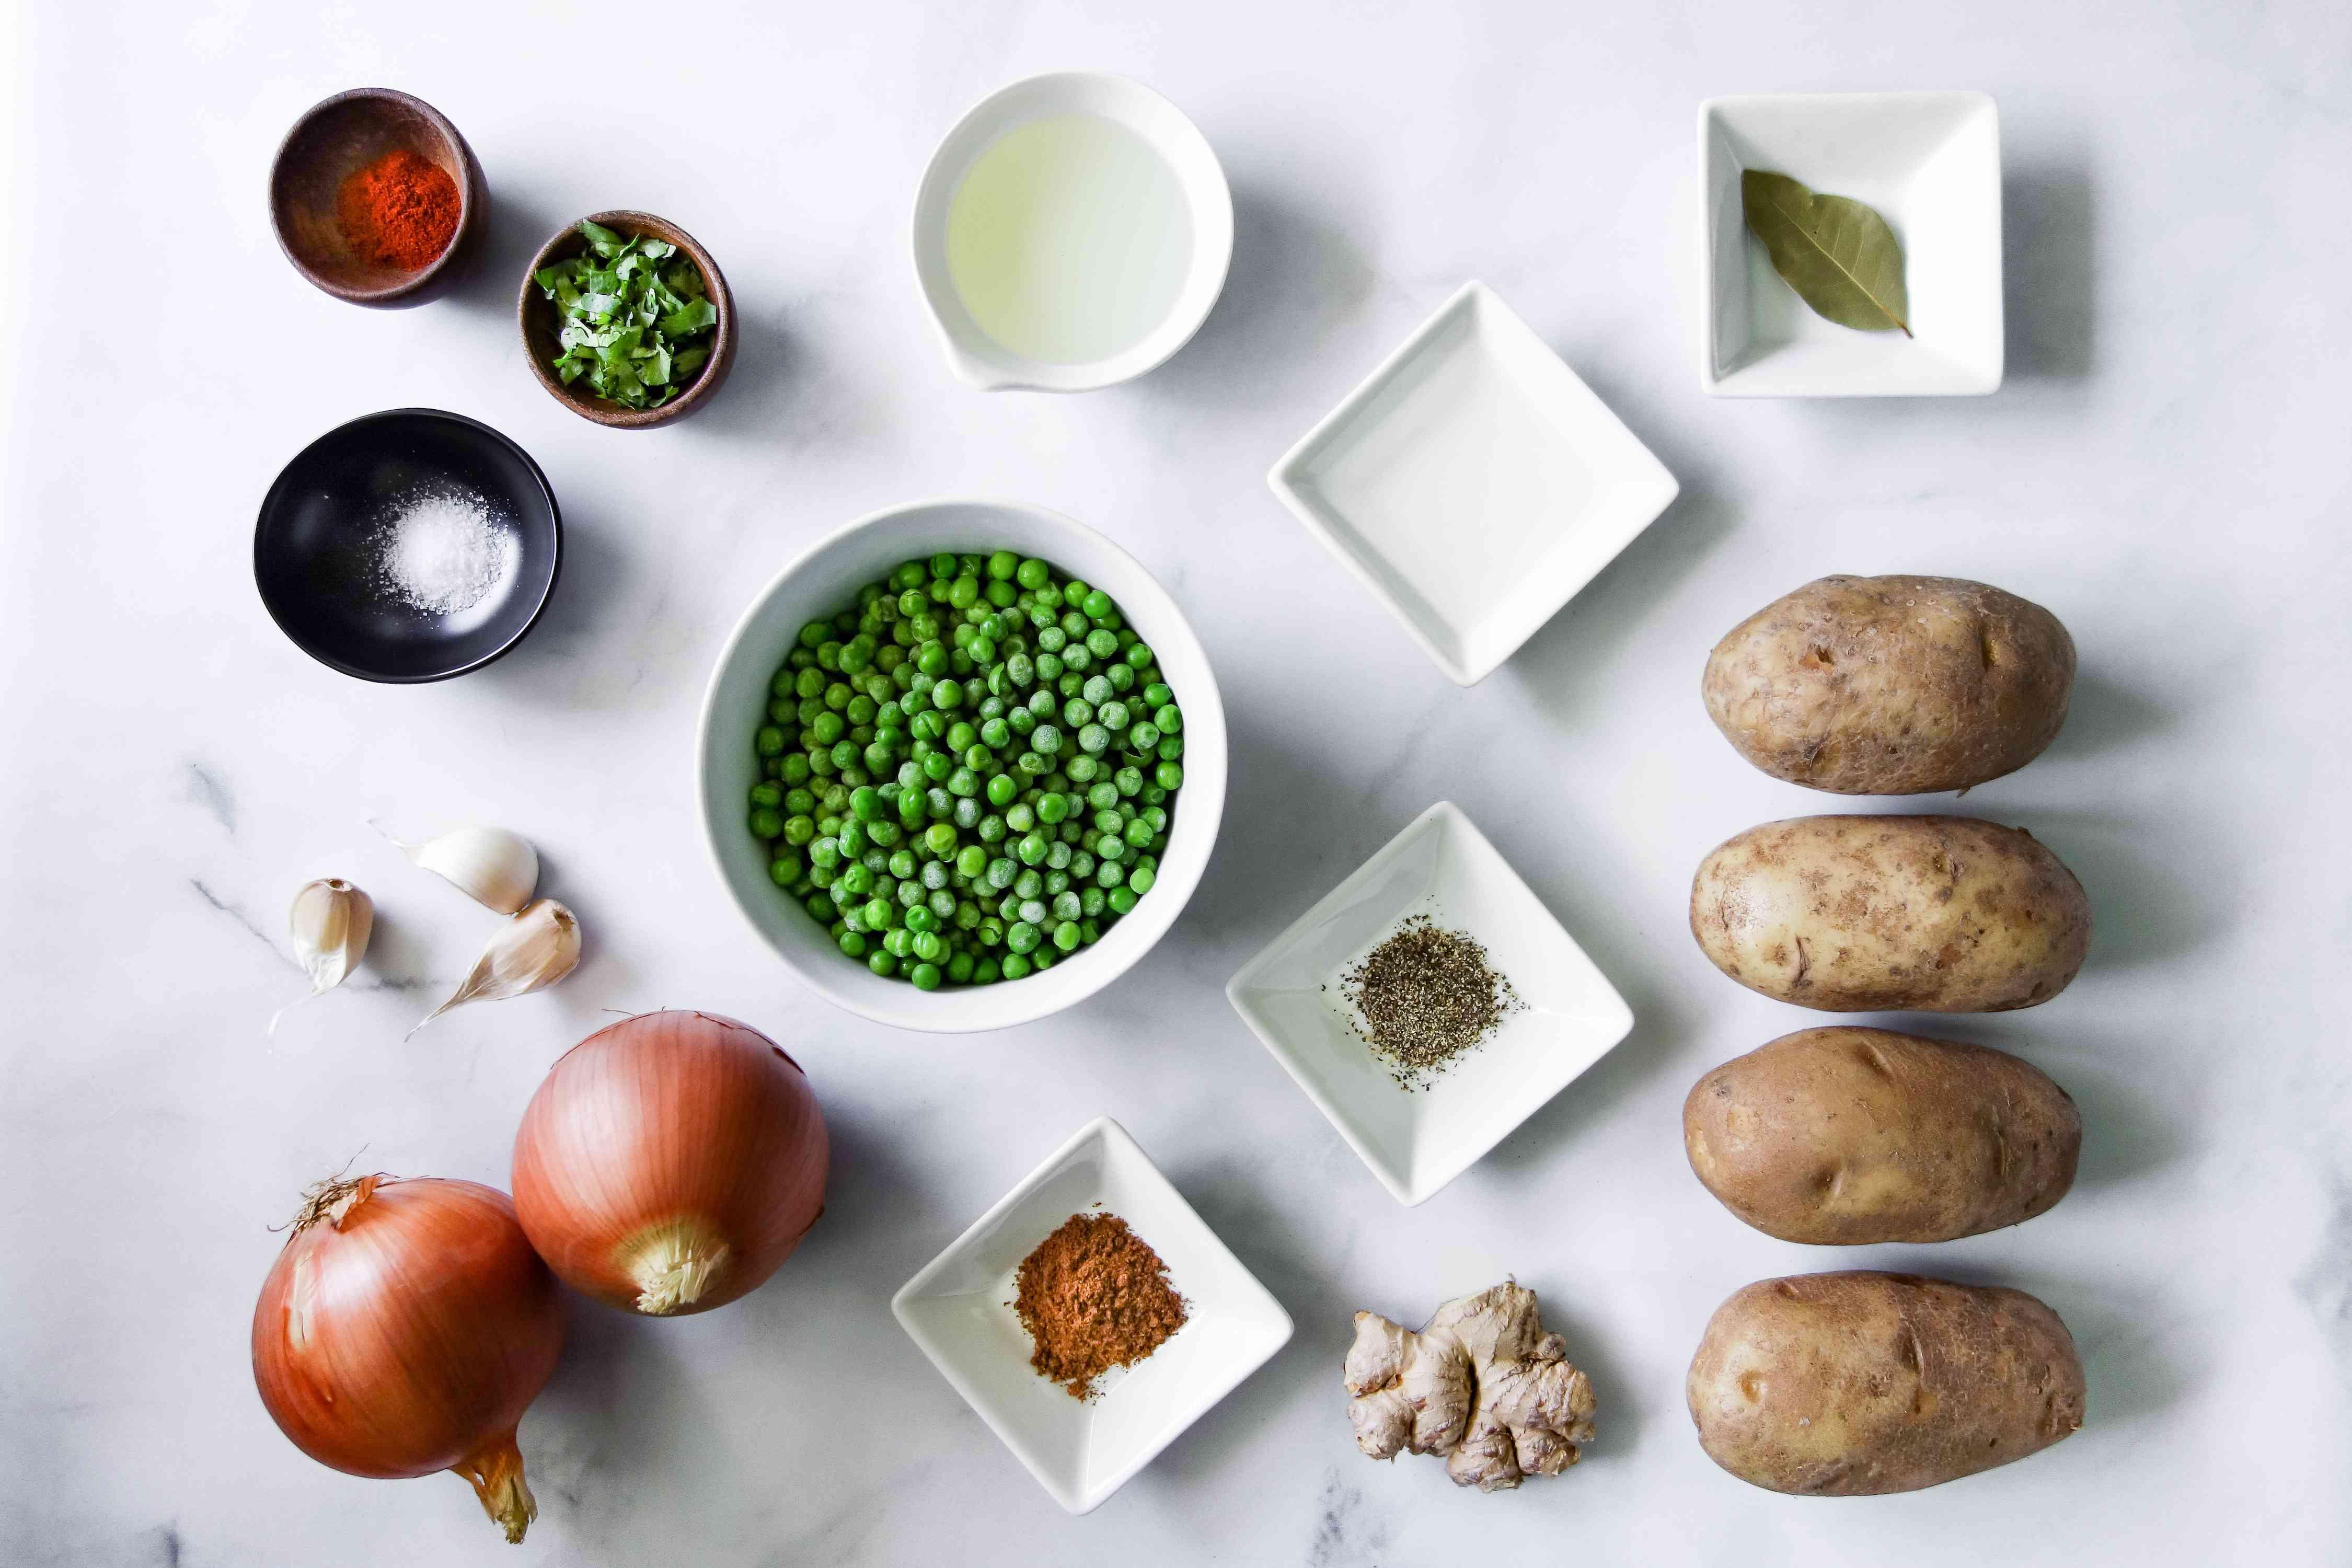 Aloo Matar (Indian Potatoes and Peas) ingredients